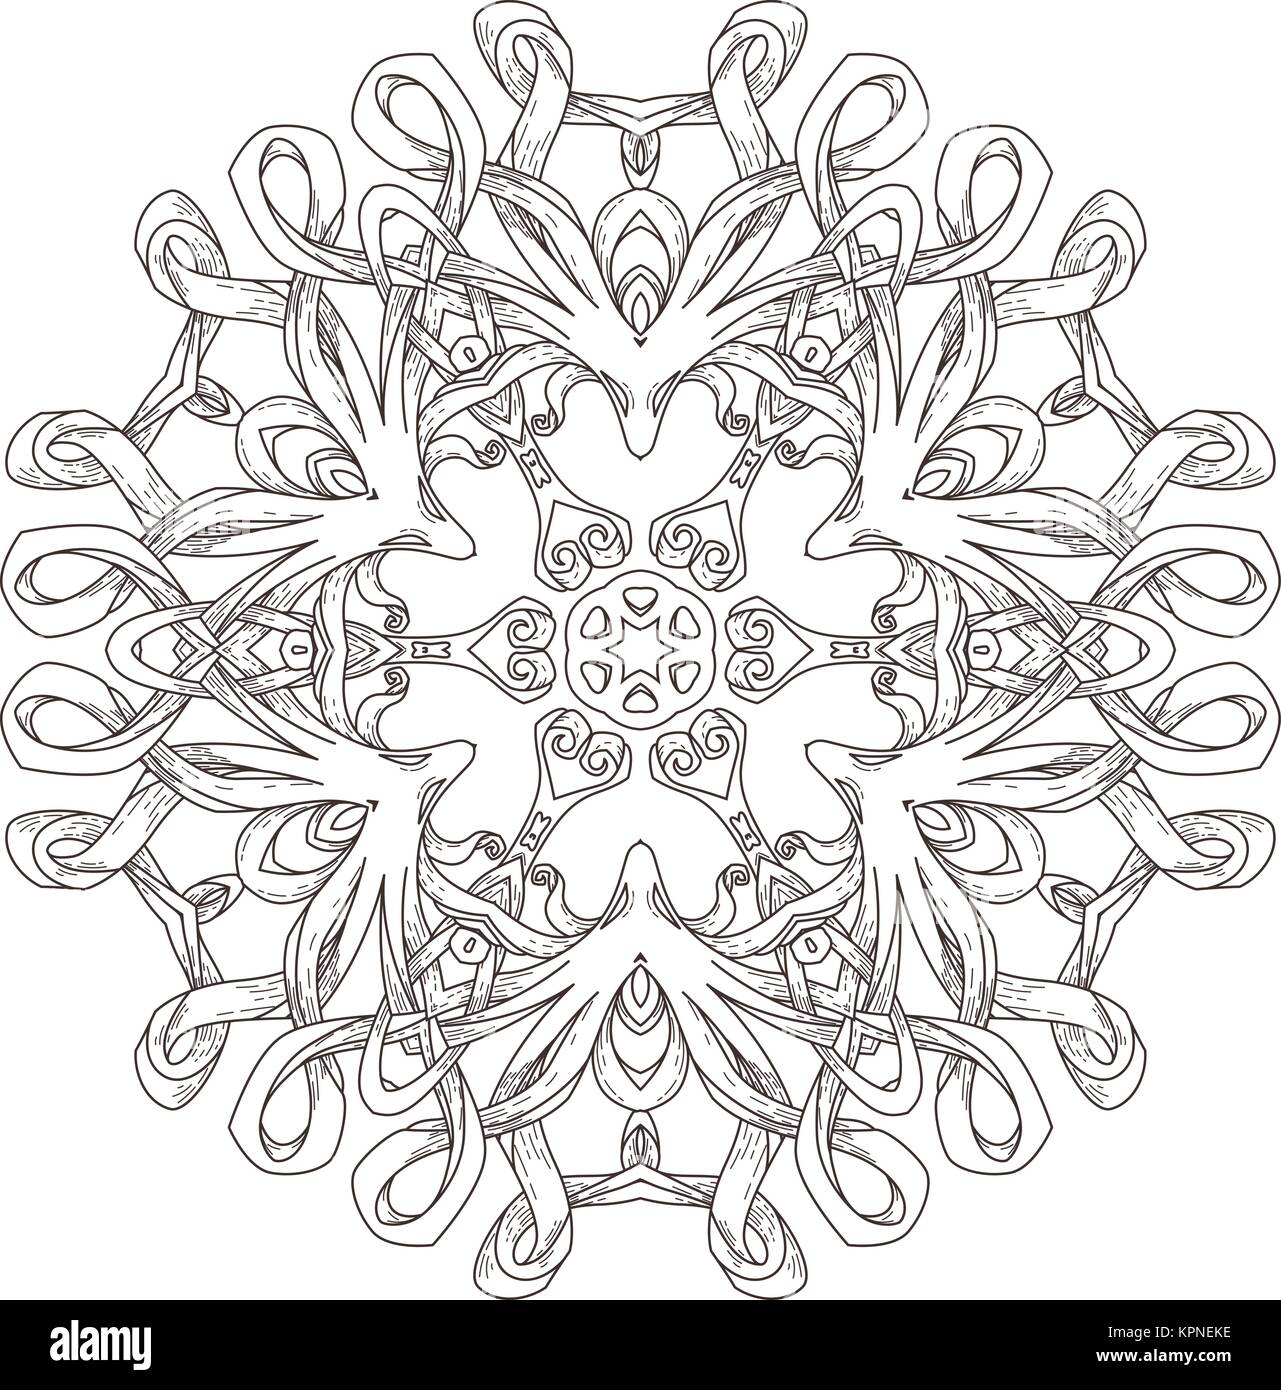 Mandala. Abstract decorative background. Islam, Arabic, oriental ...